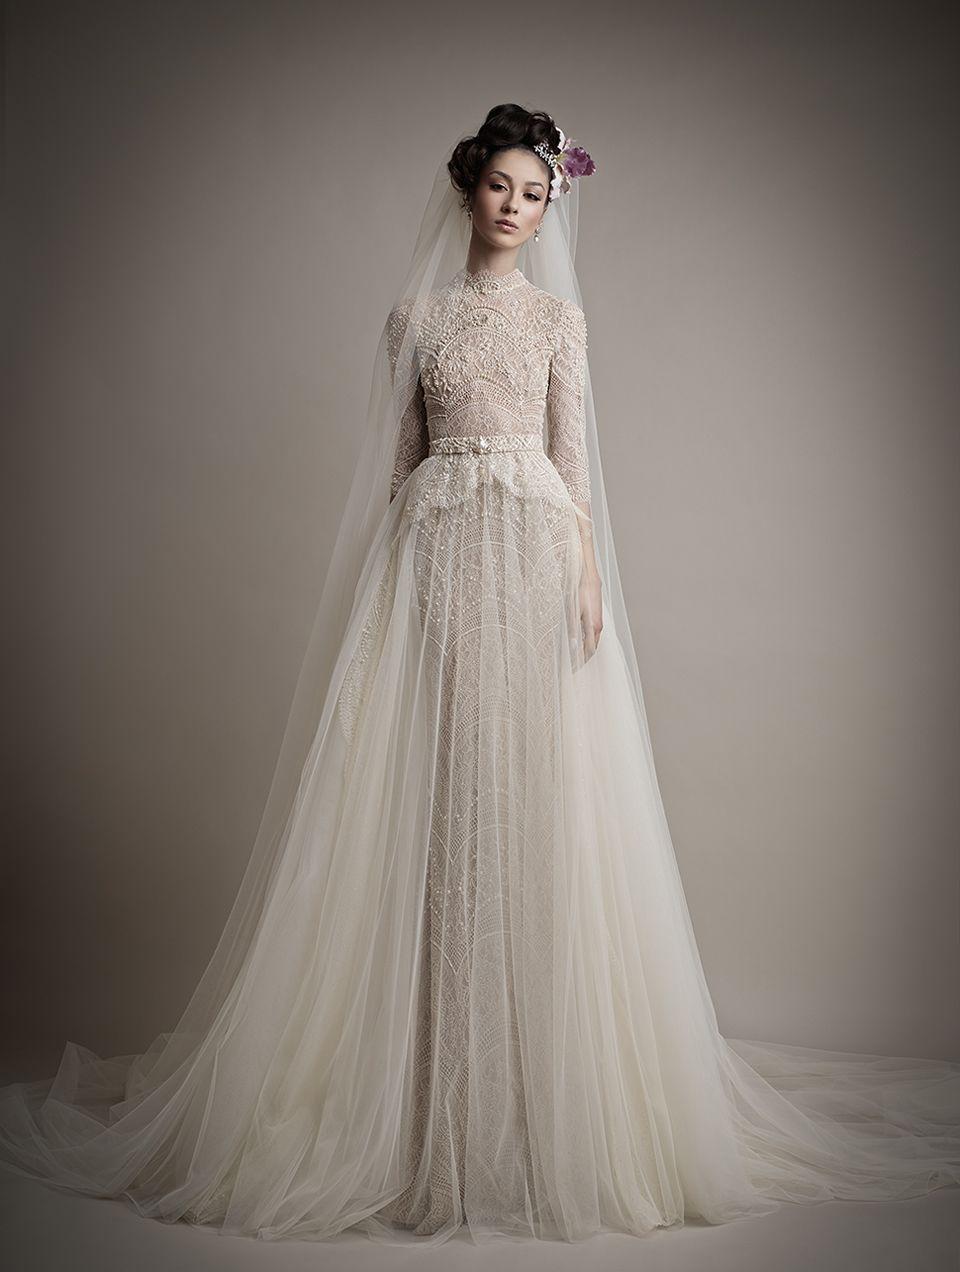 Ersa Atelier Wedding Dresses 2015 Modwedding Wedding Dress Trends Top Wedding Dresses Wedding Dress Long Sleeve